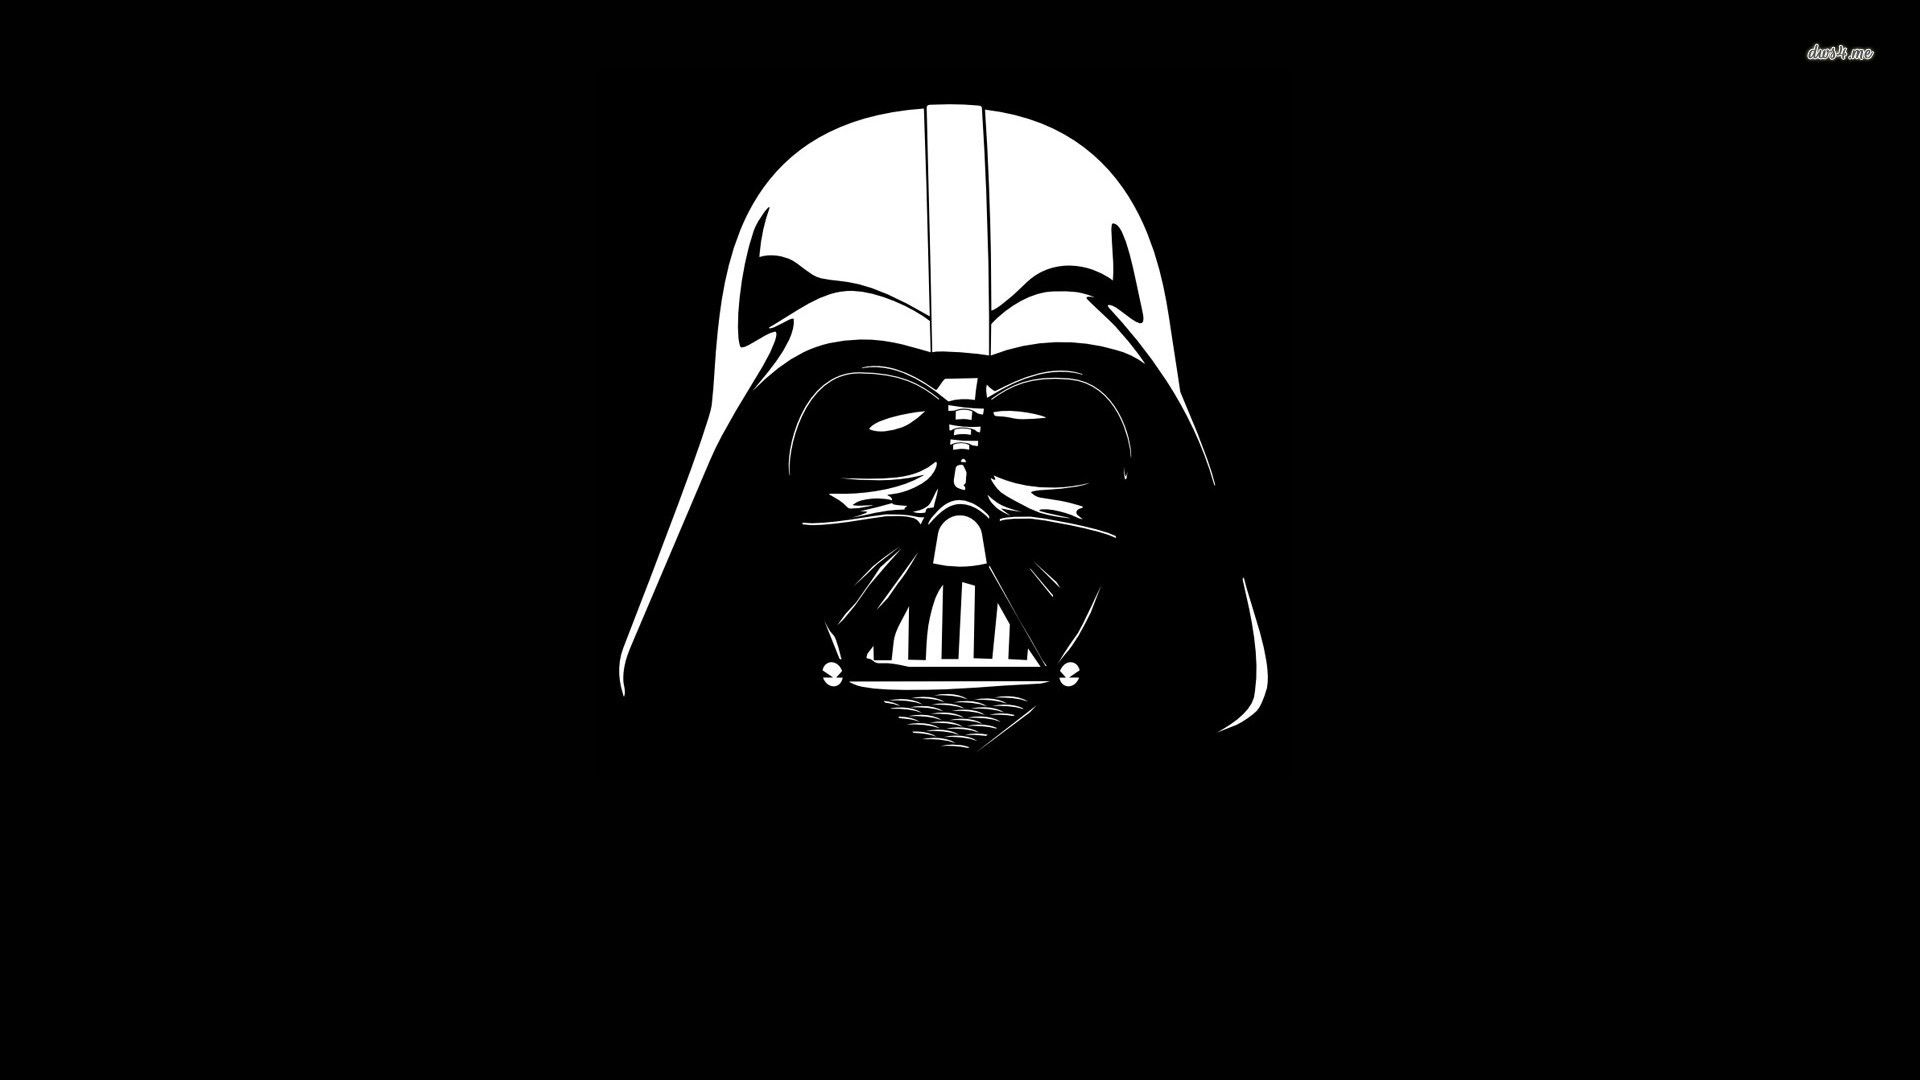 star wars darth vader wallpapers desktop background movies | star